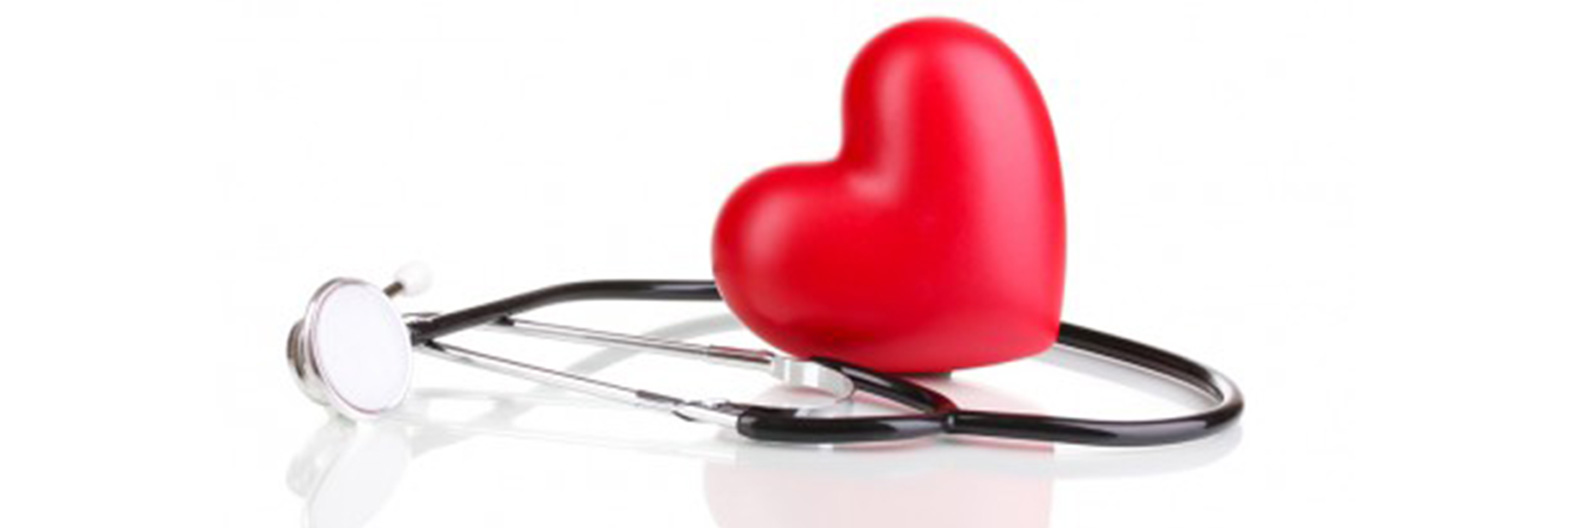 hipertenzijos atvejų istorija hipertenzijos ministerija